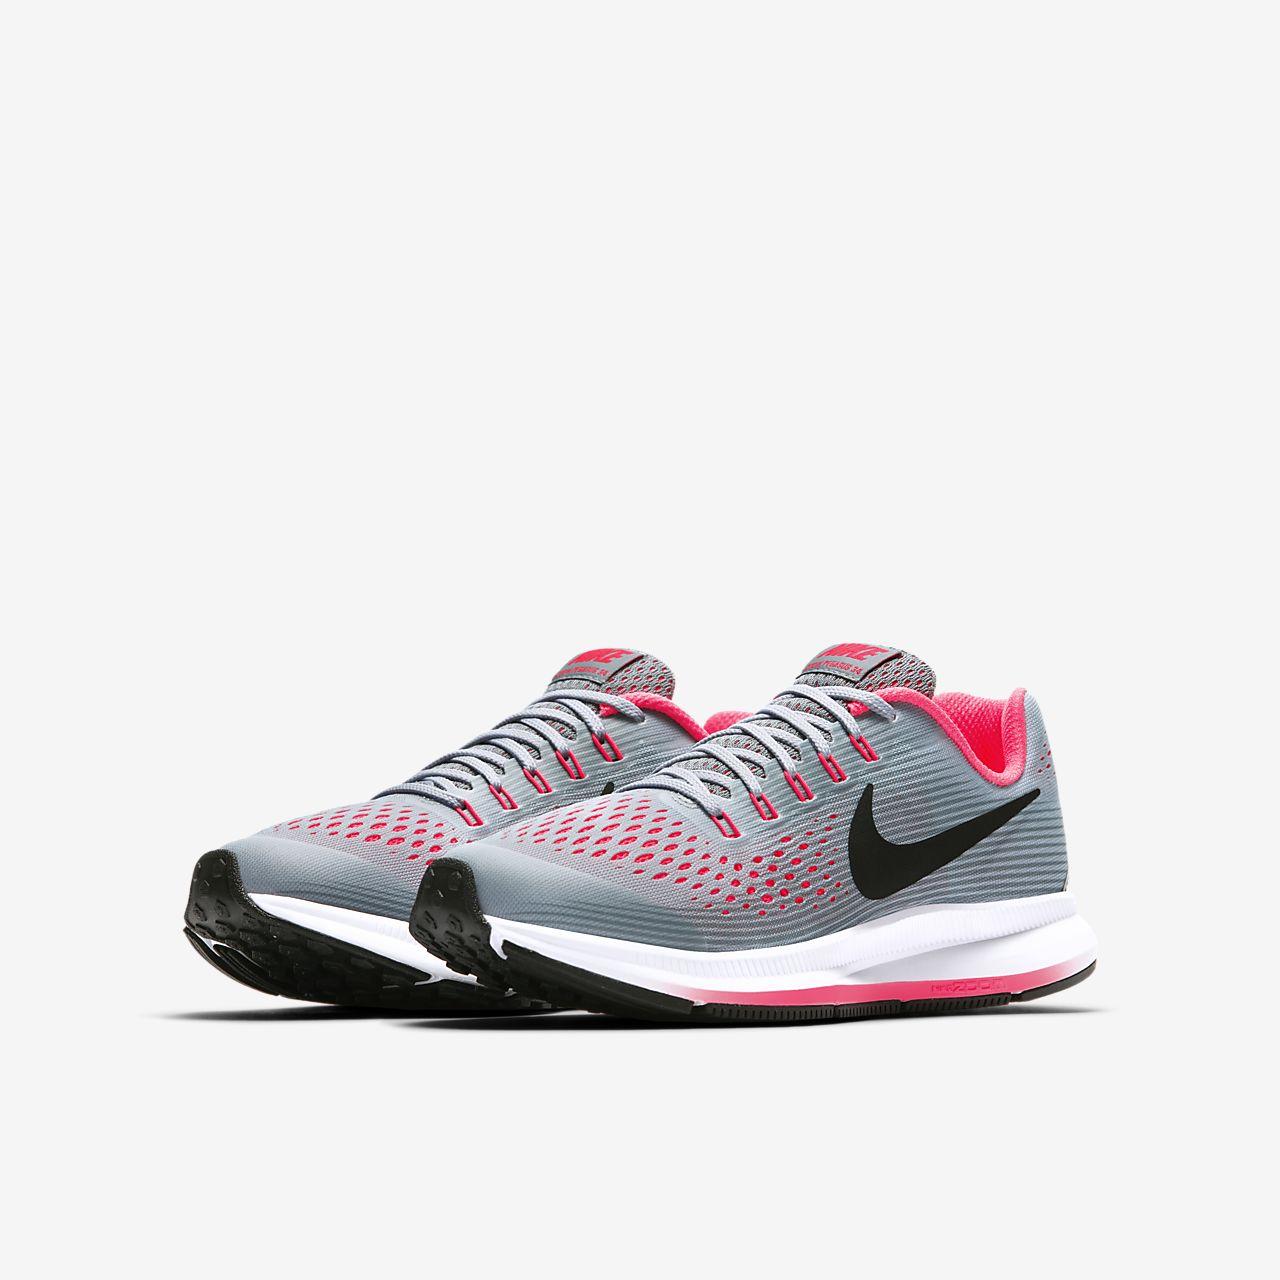 Chaussures - Bas-tops Et Chaussures De Sport 181 Ag u45LS7